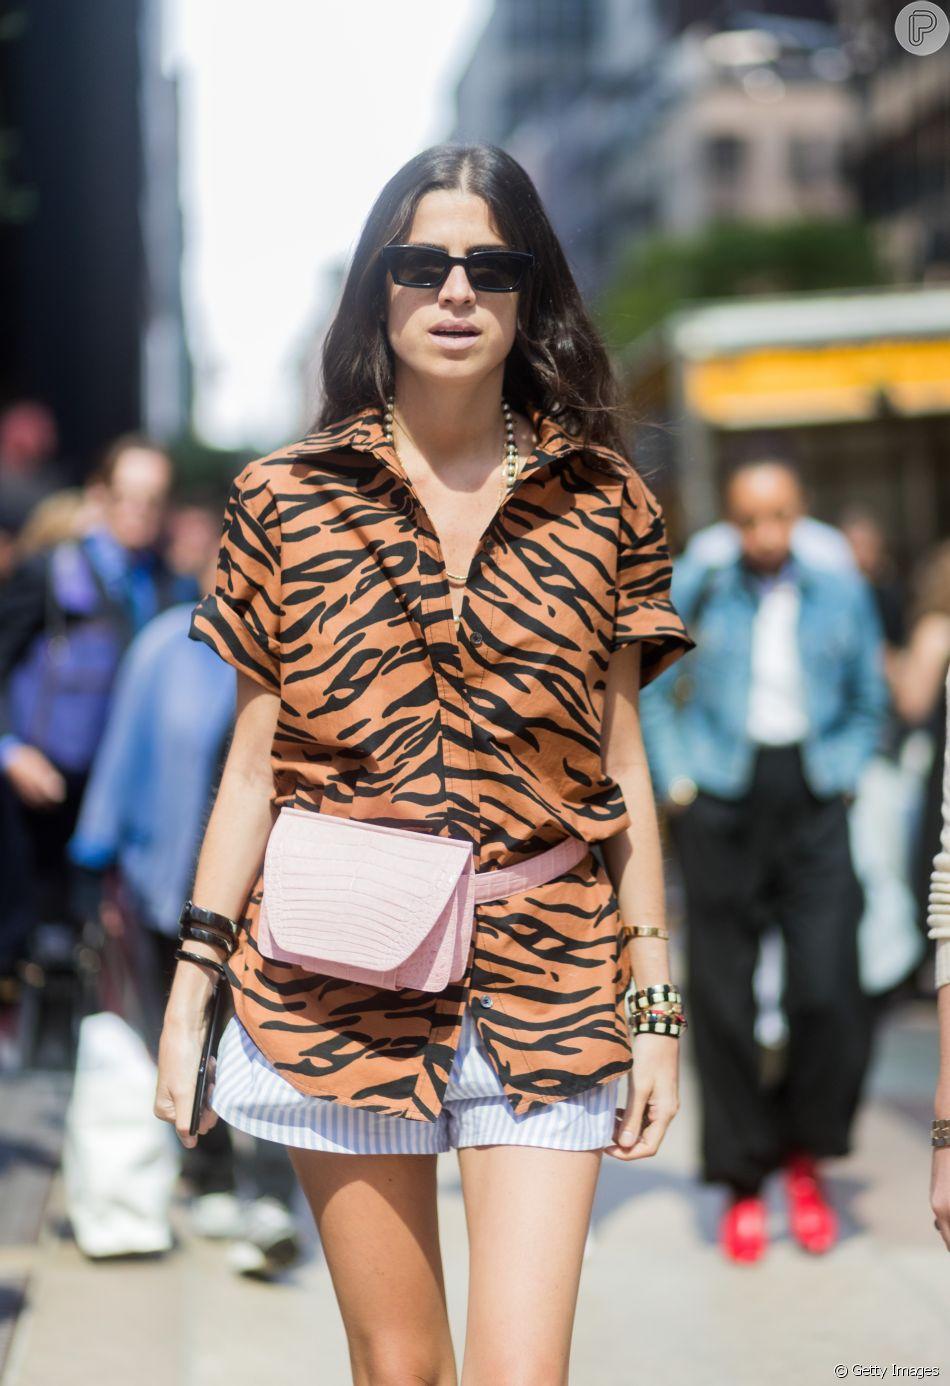 Animal print bem verão: camisa + shortinho + pochete